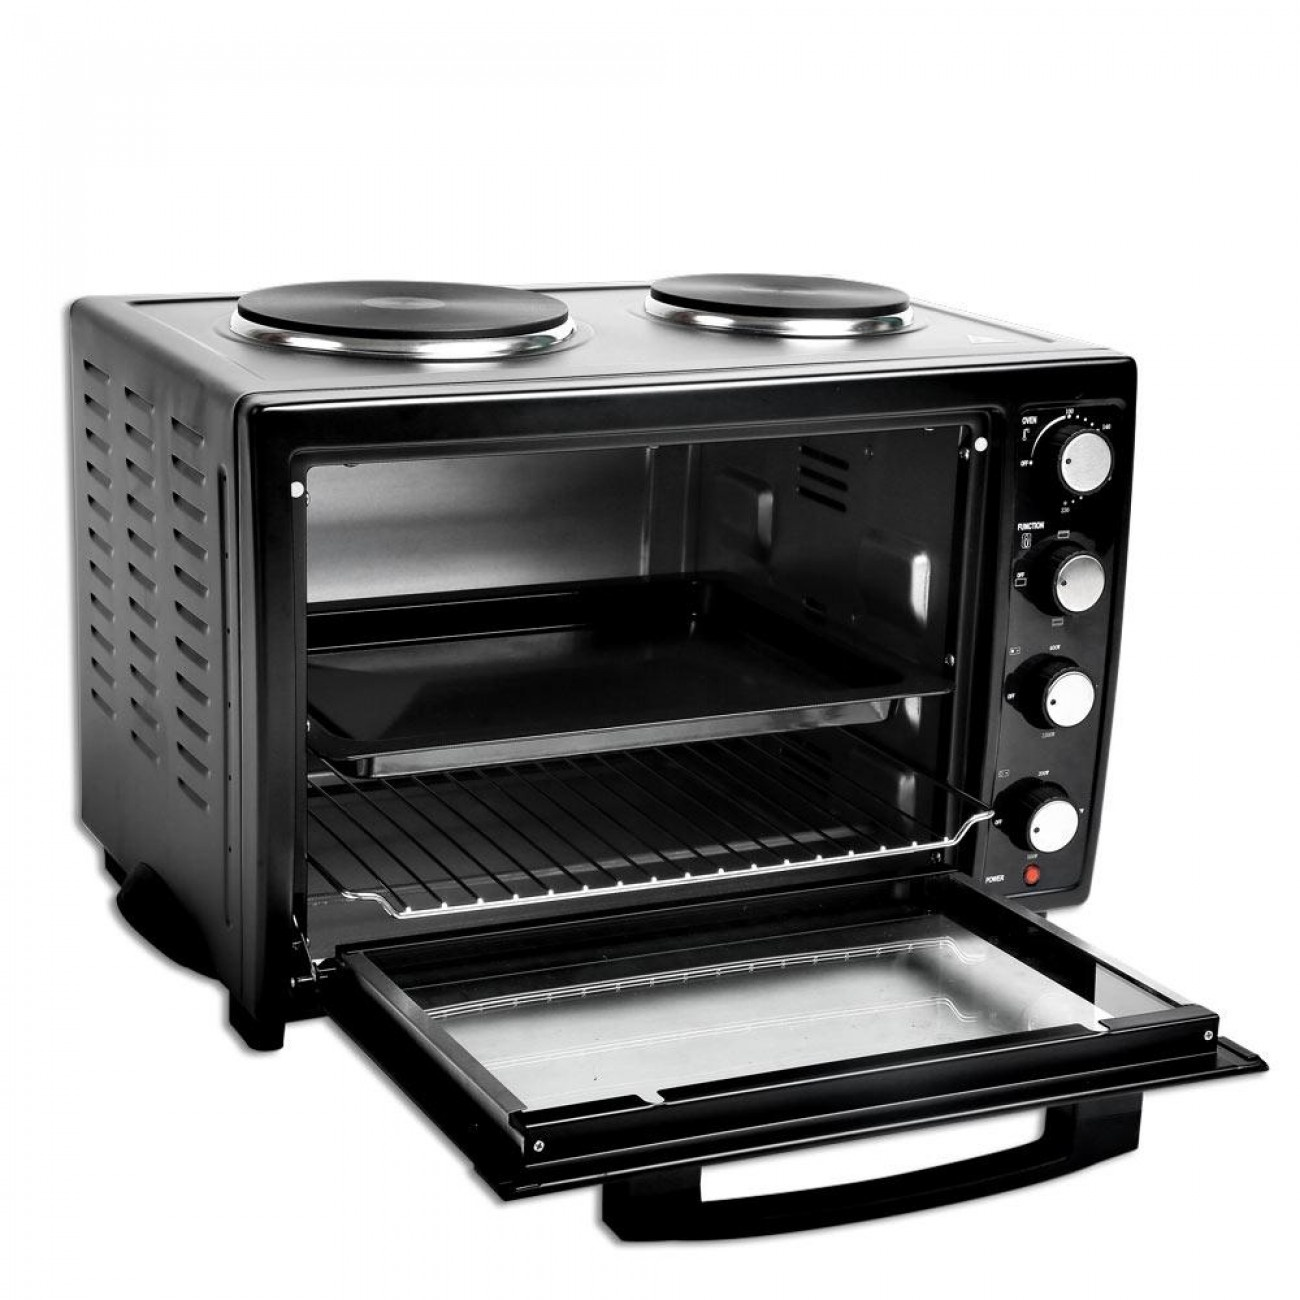 Готварска печка ZEPHYR ZP 1441 S35, 3300W, 35 л. Два котлона, Черен в Готварски печки - ZEPHYR | Alleop